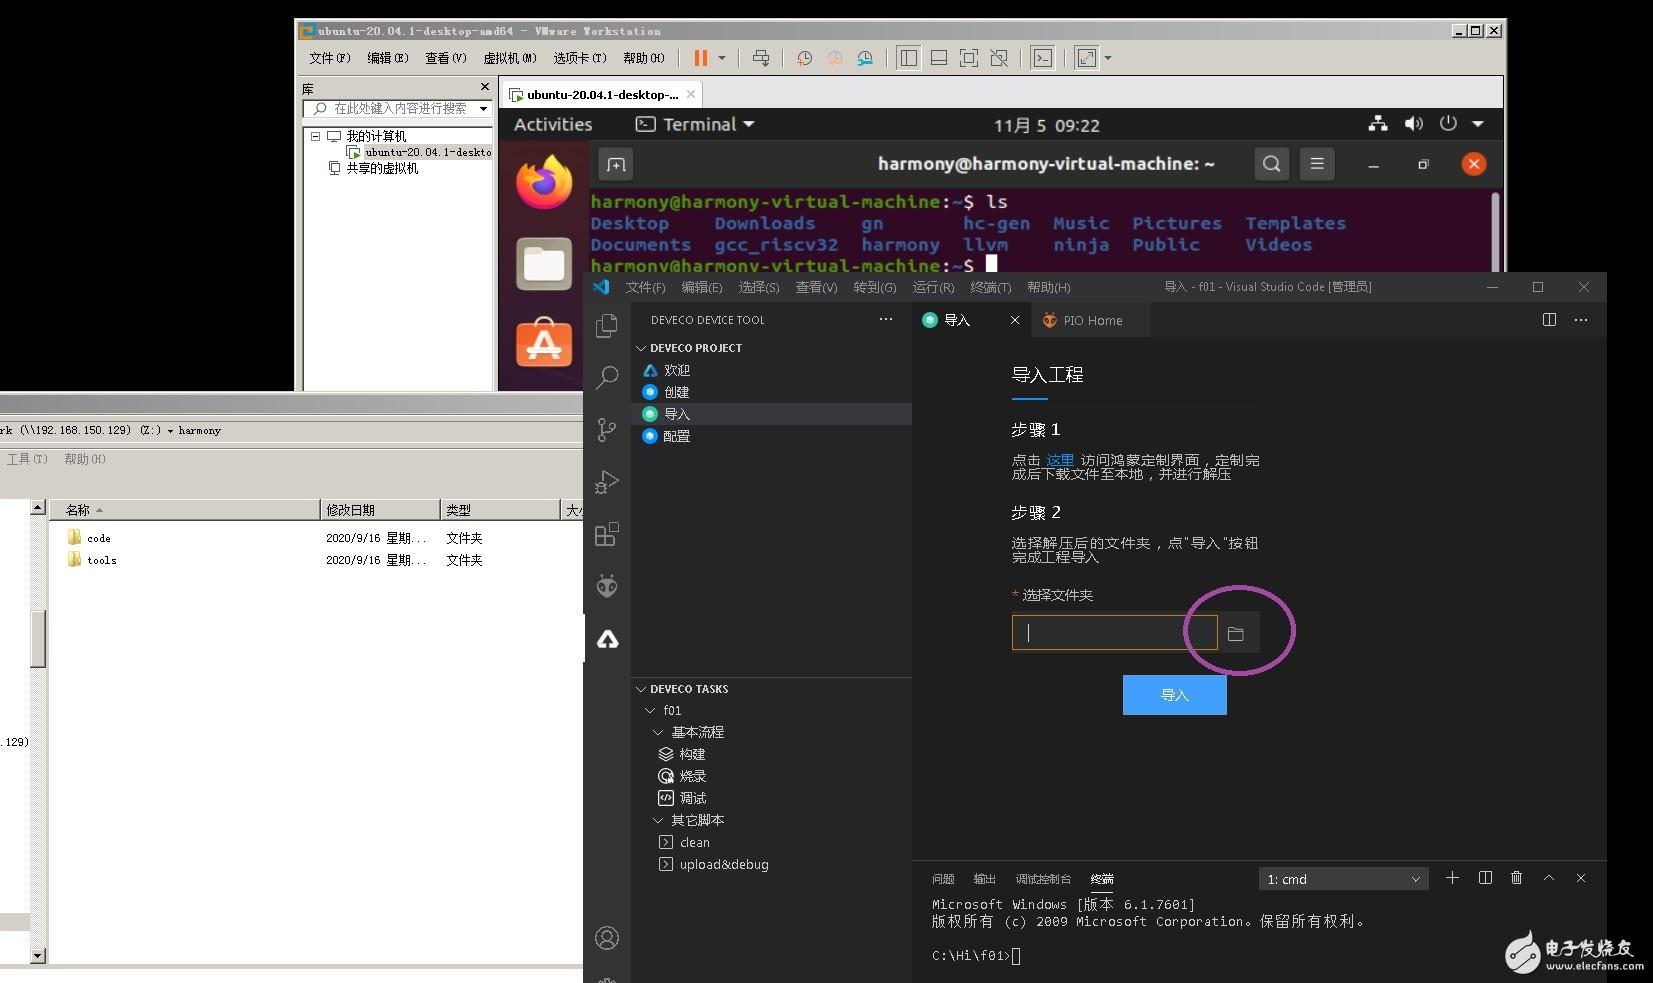 【HarmonyOS HiSpark Wi-Fi IoT 套件试用连载】1-串口输出Hello World(详细步骤)